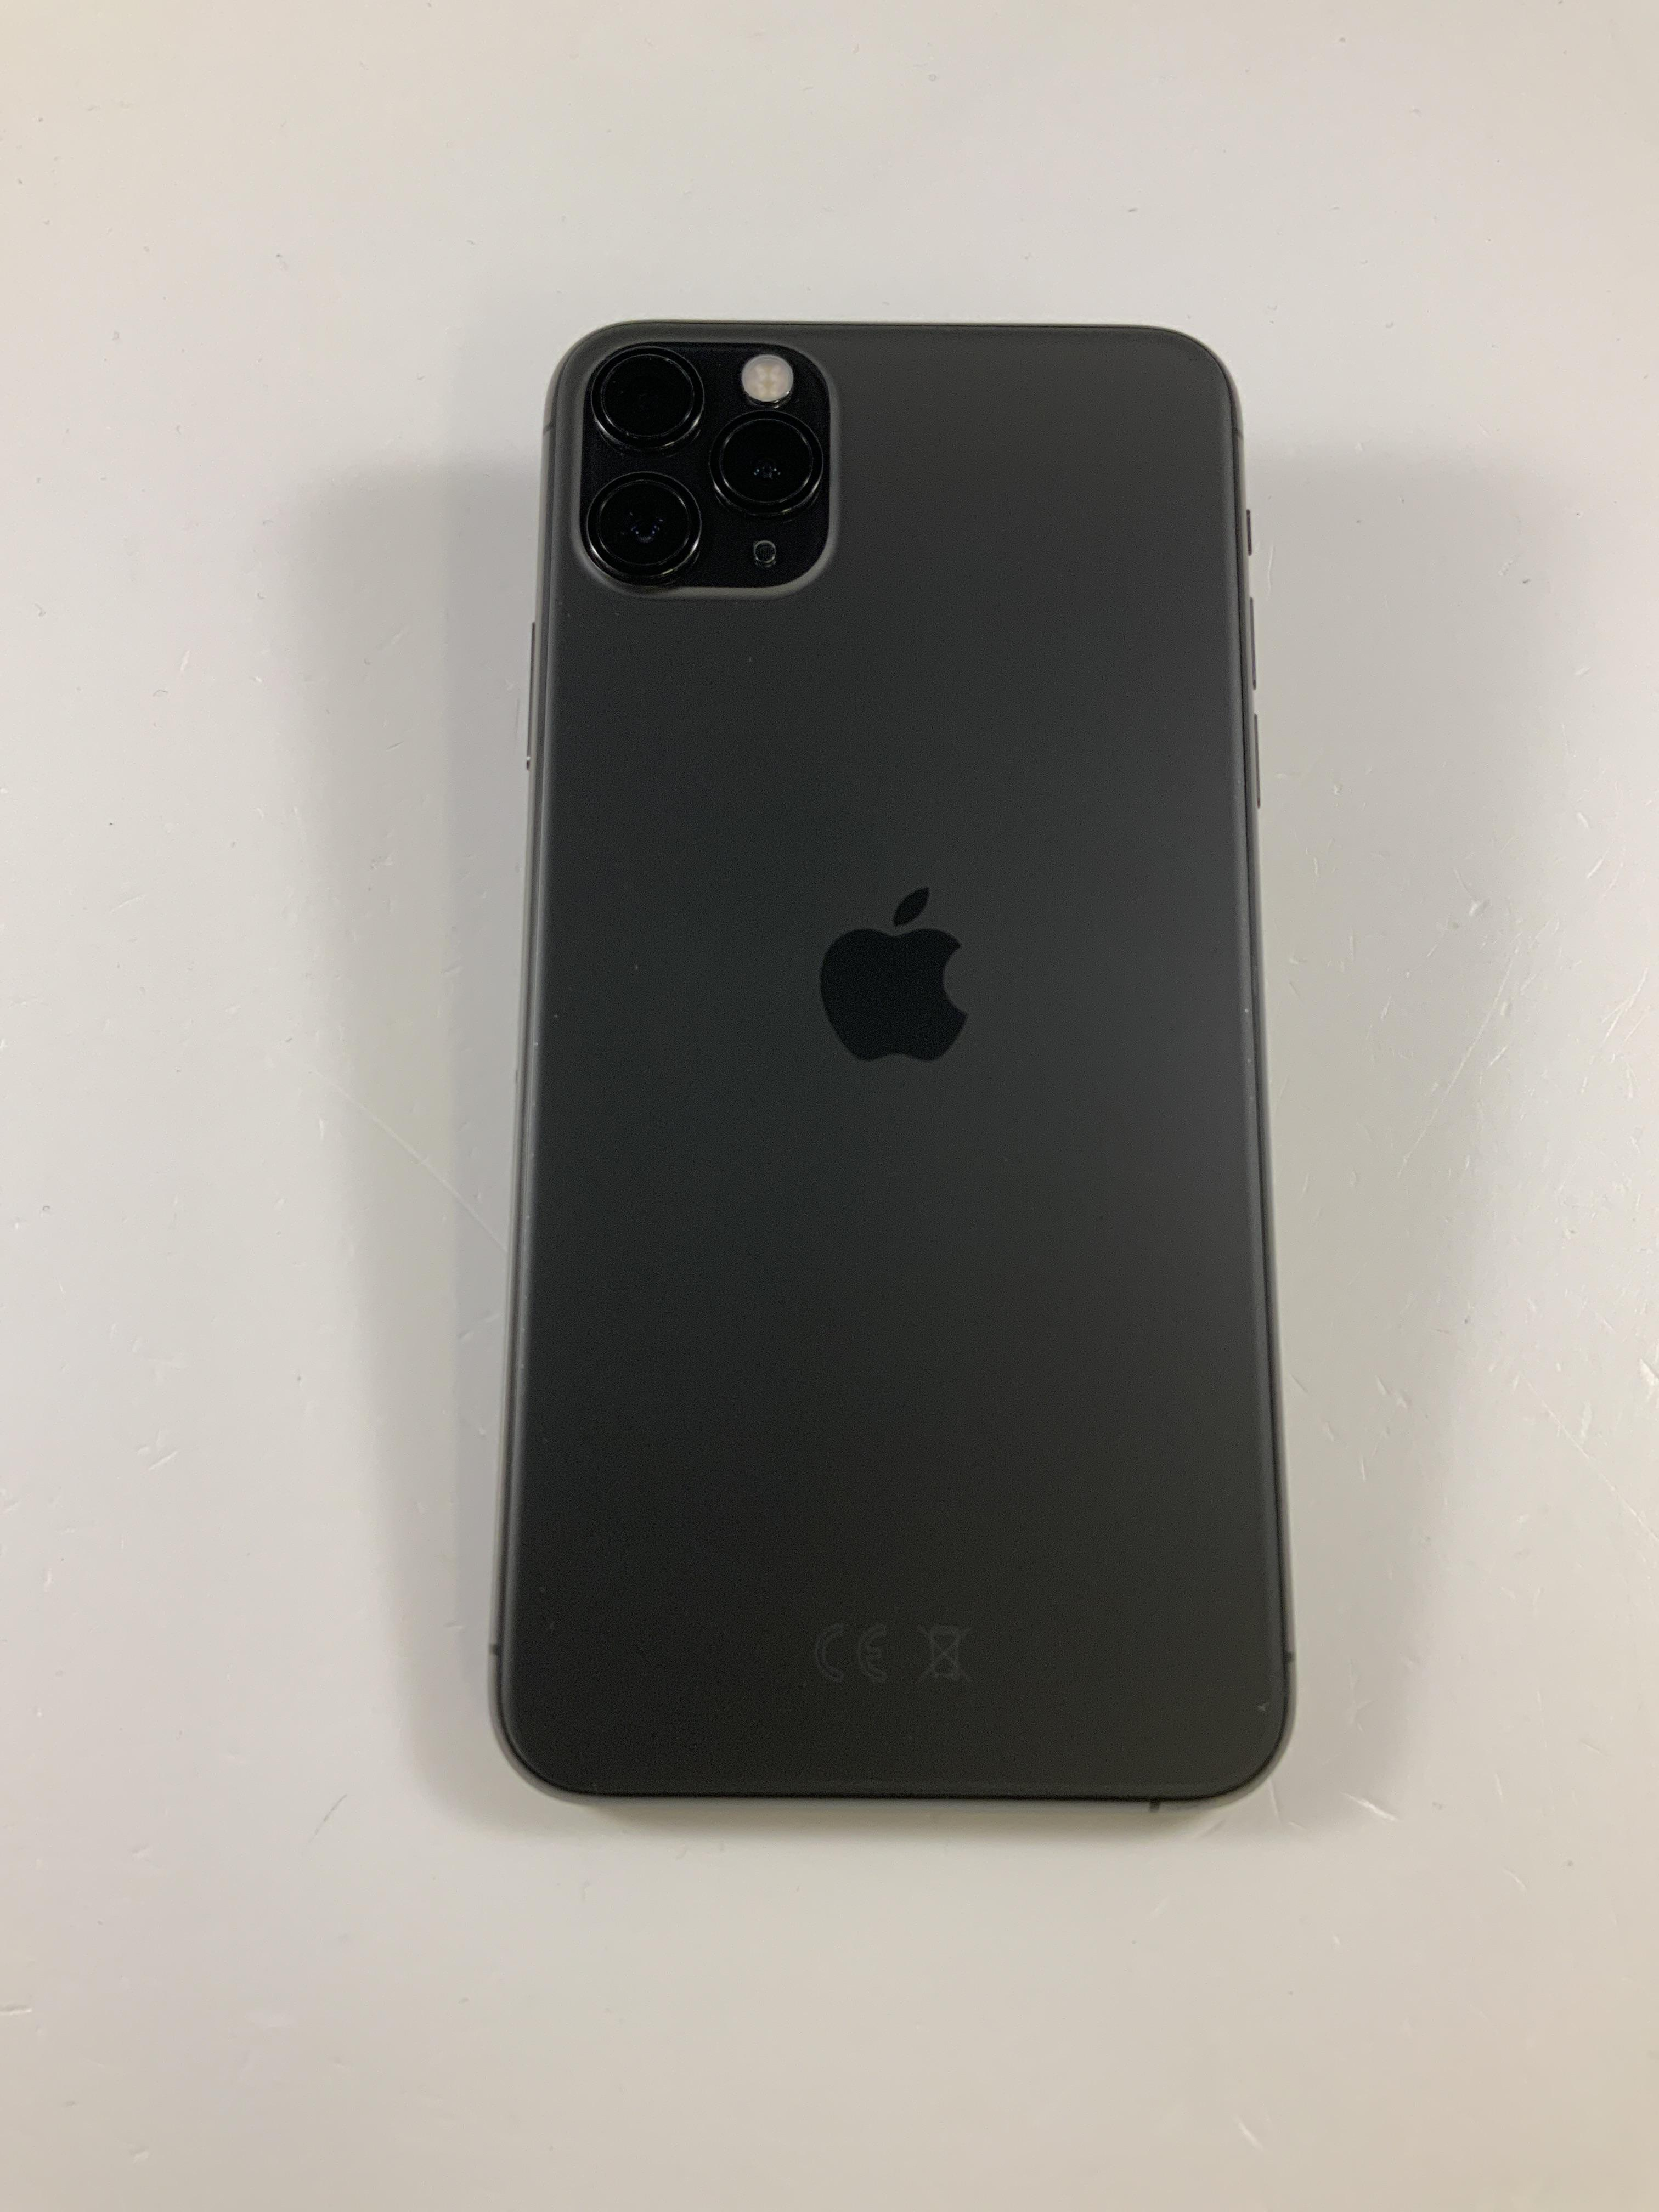 iPhone 11 Pro Max 256GB, 256GB, Space Gray, Bild 2